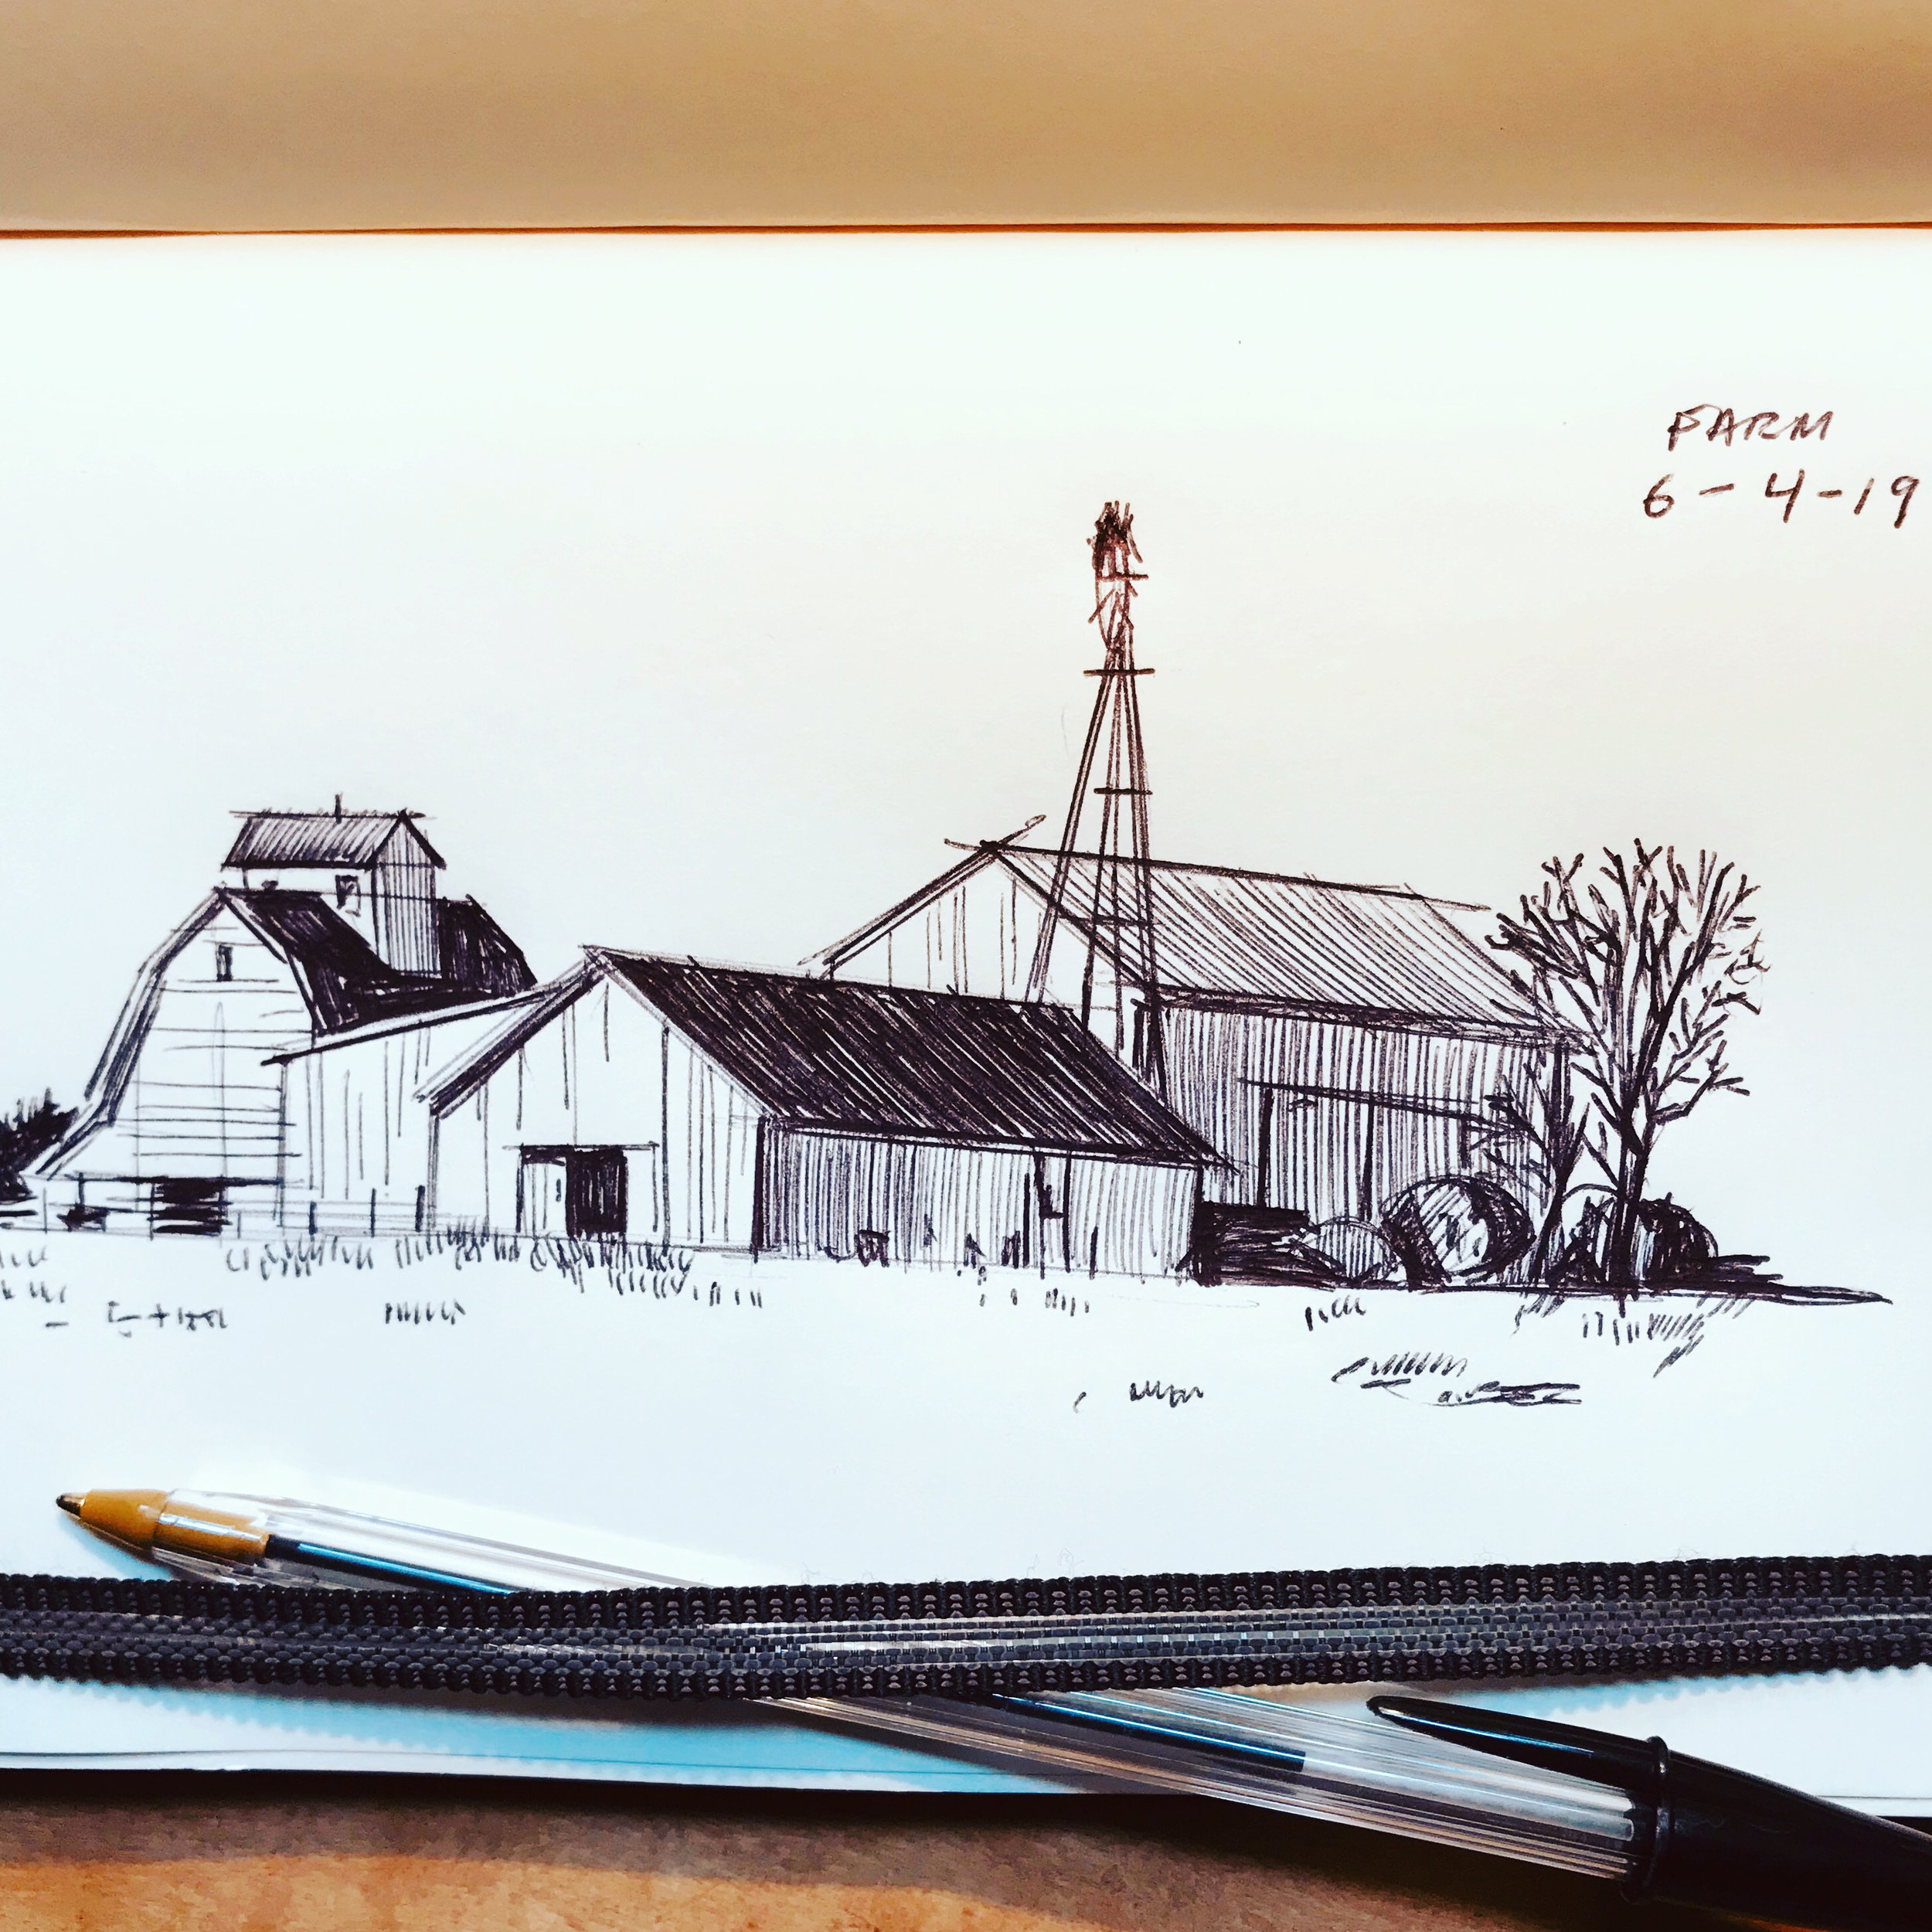 Farm_6_4_19.jpg